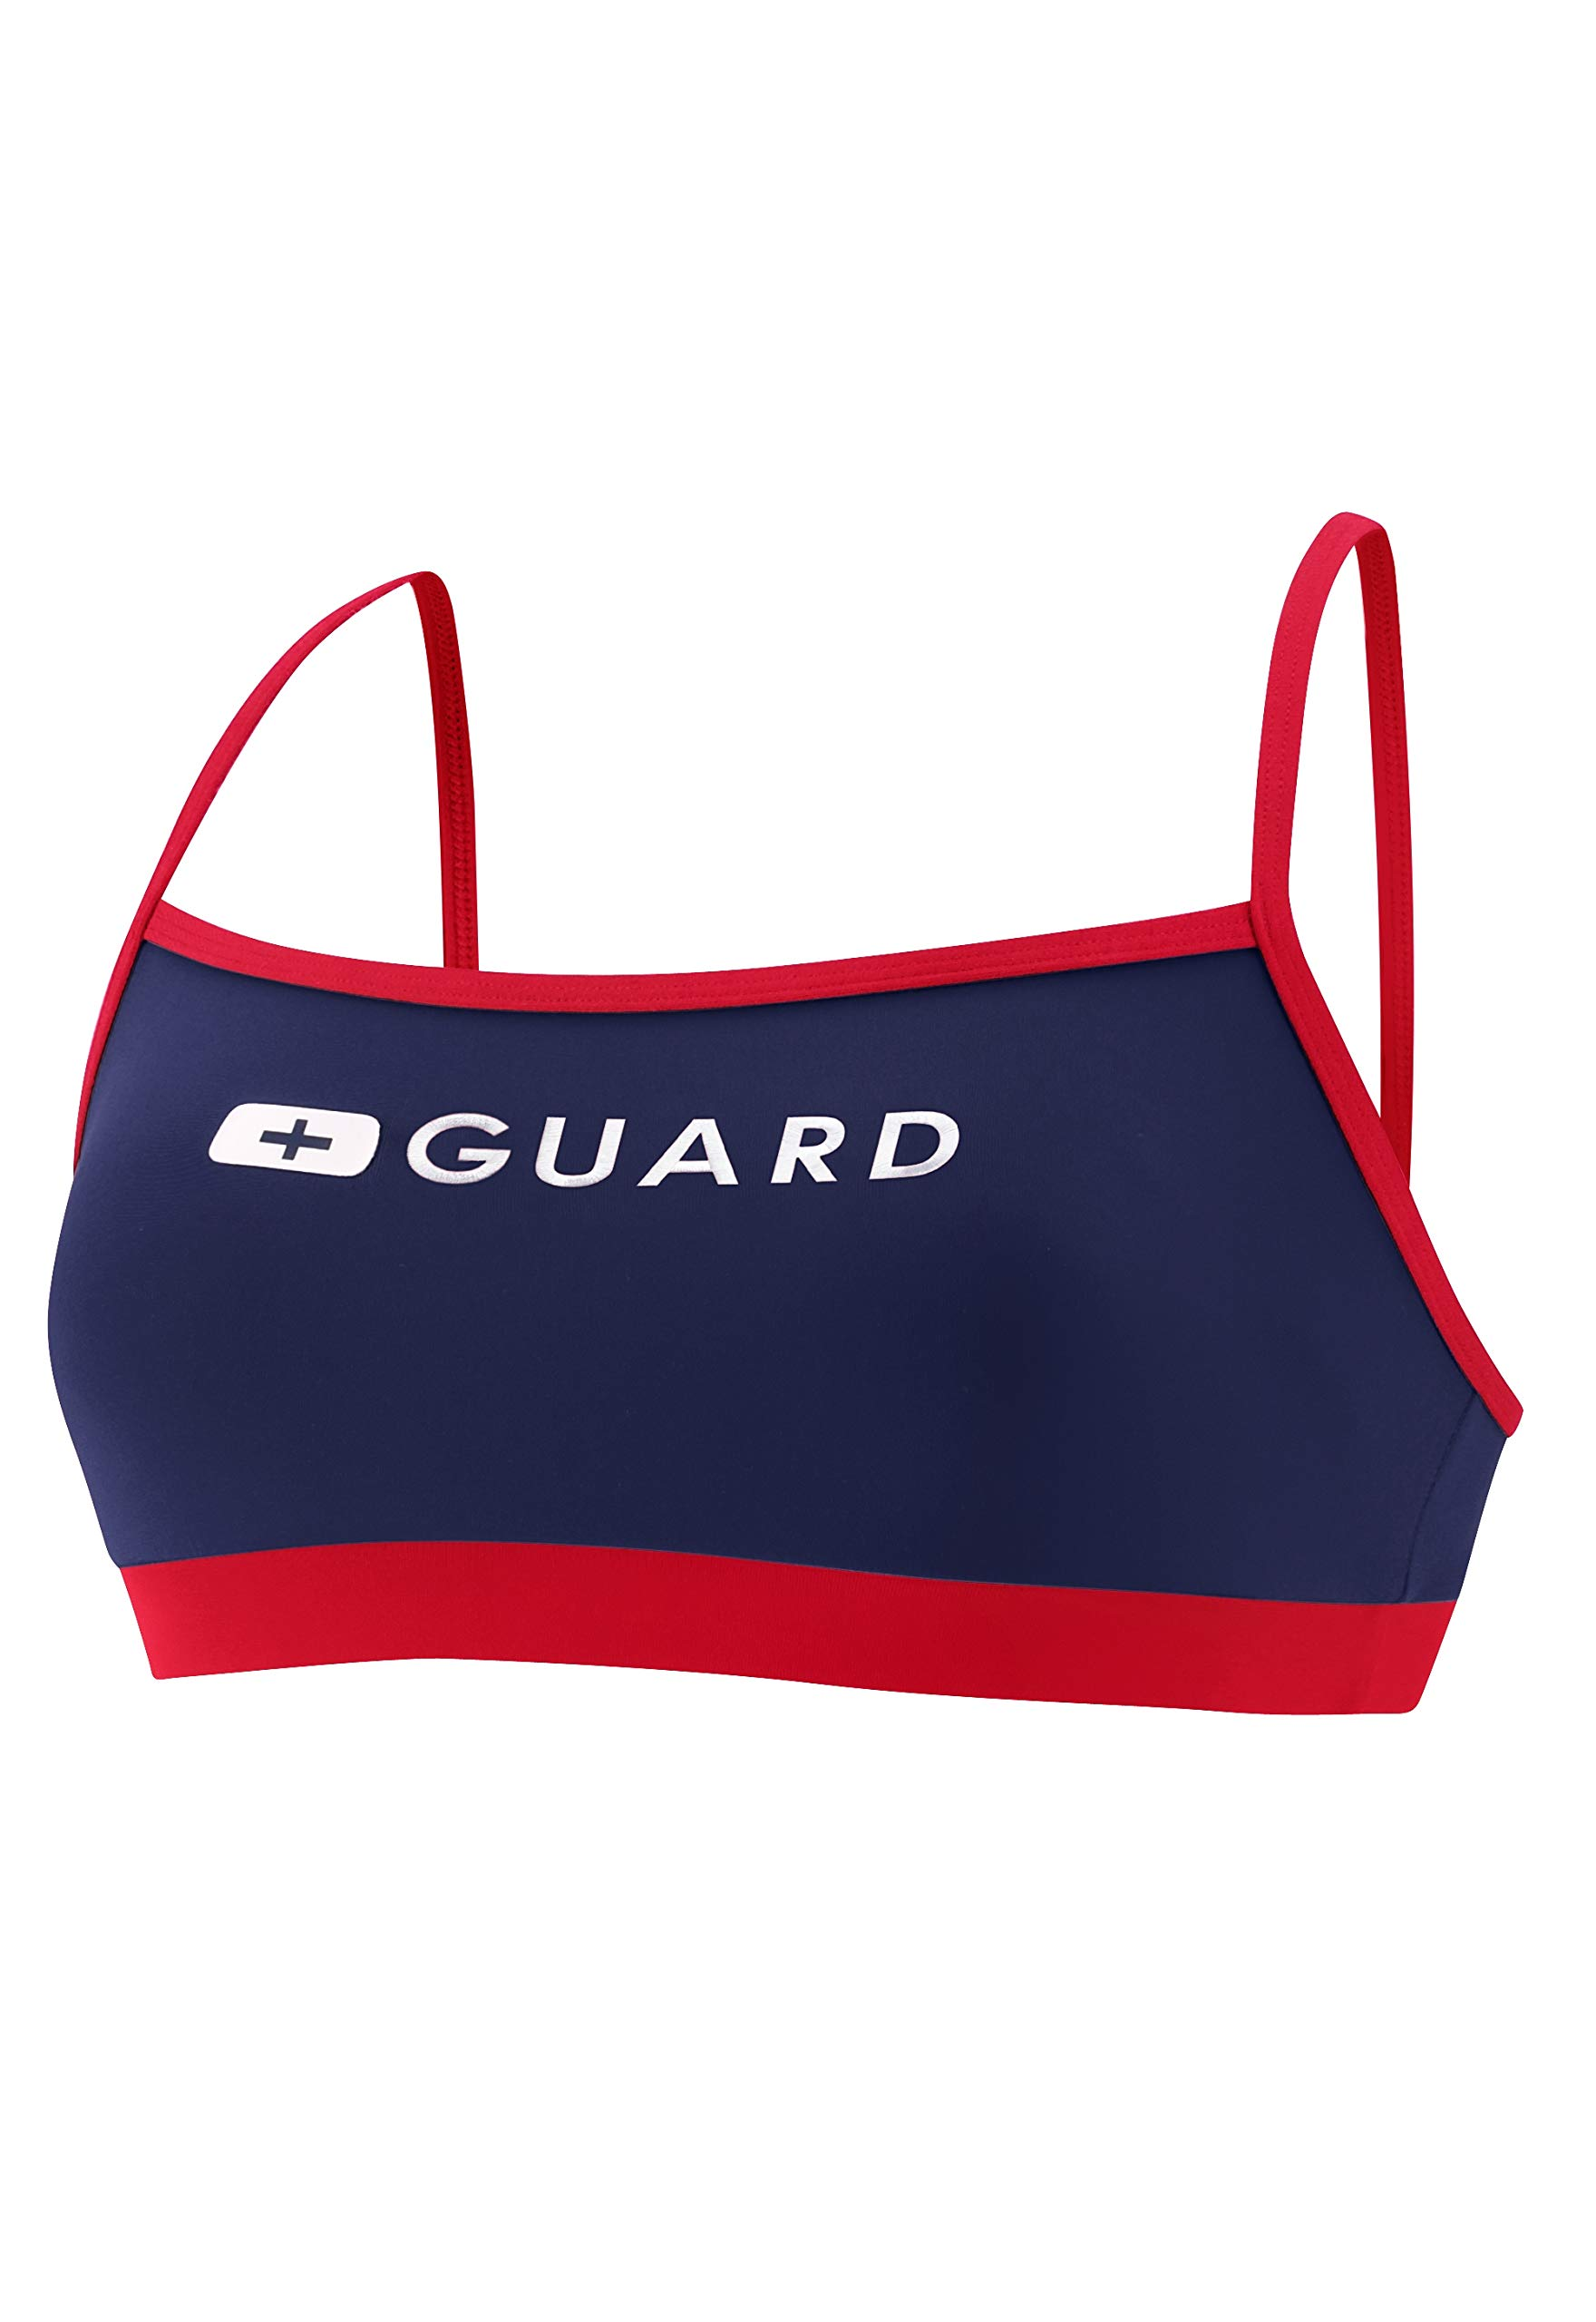 Speedo Guard Thin Strap Top - Endurance Lite, US